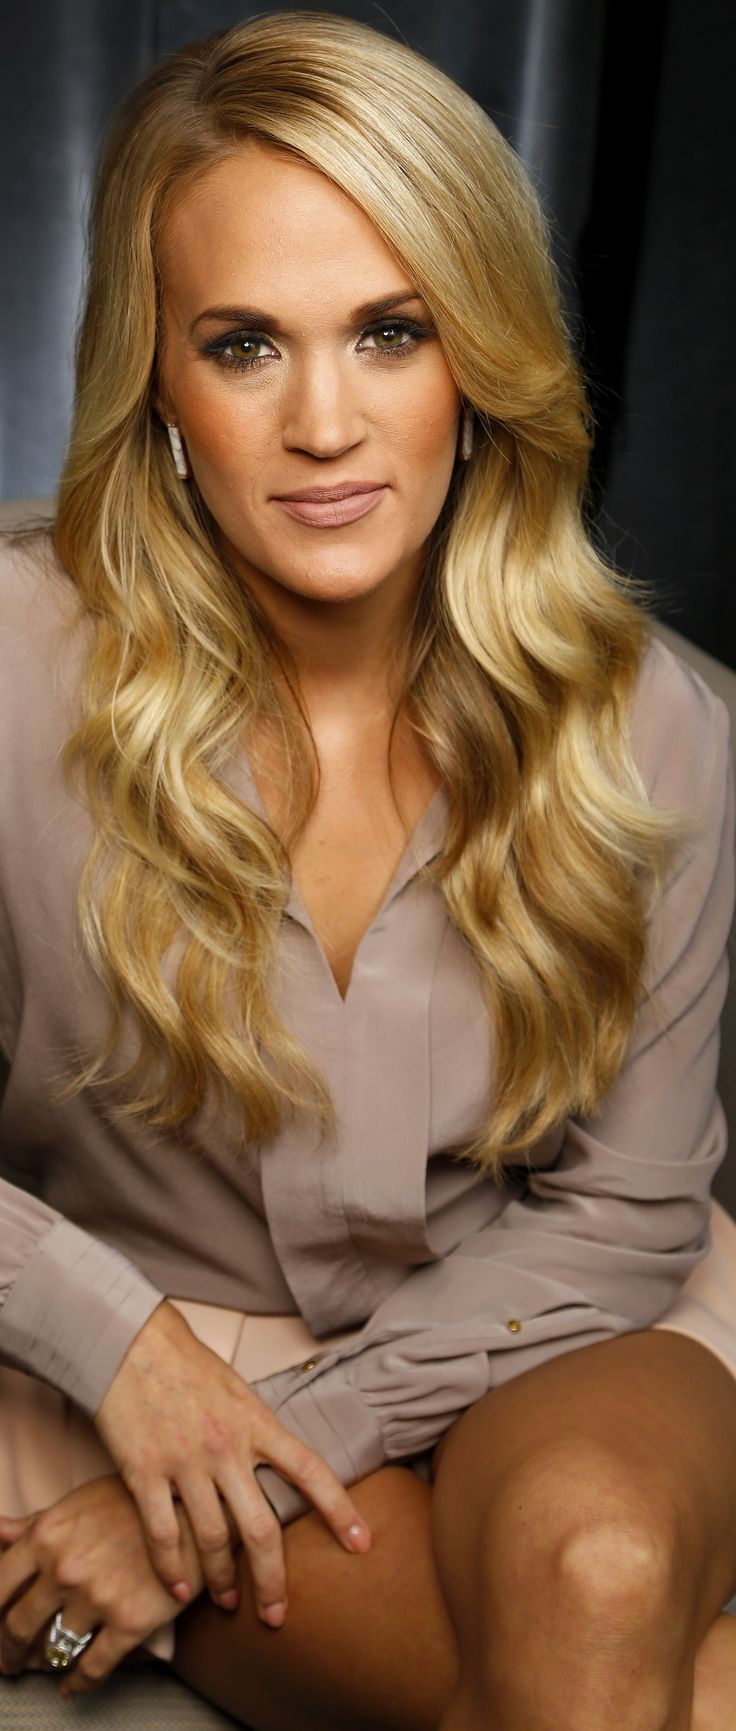 Carrie Underwood You SLAY! I LOVE YOUR MUSIC SO MUCH! #Storyteller #CarrieUnderwood